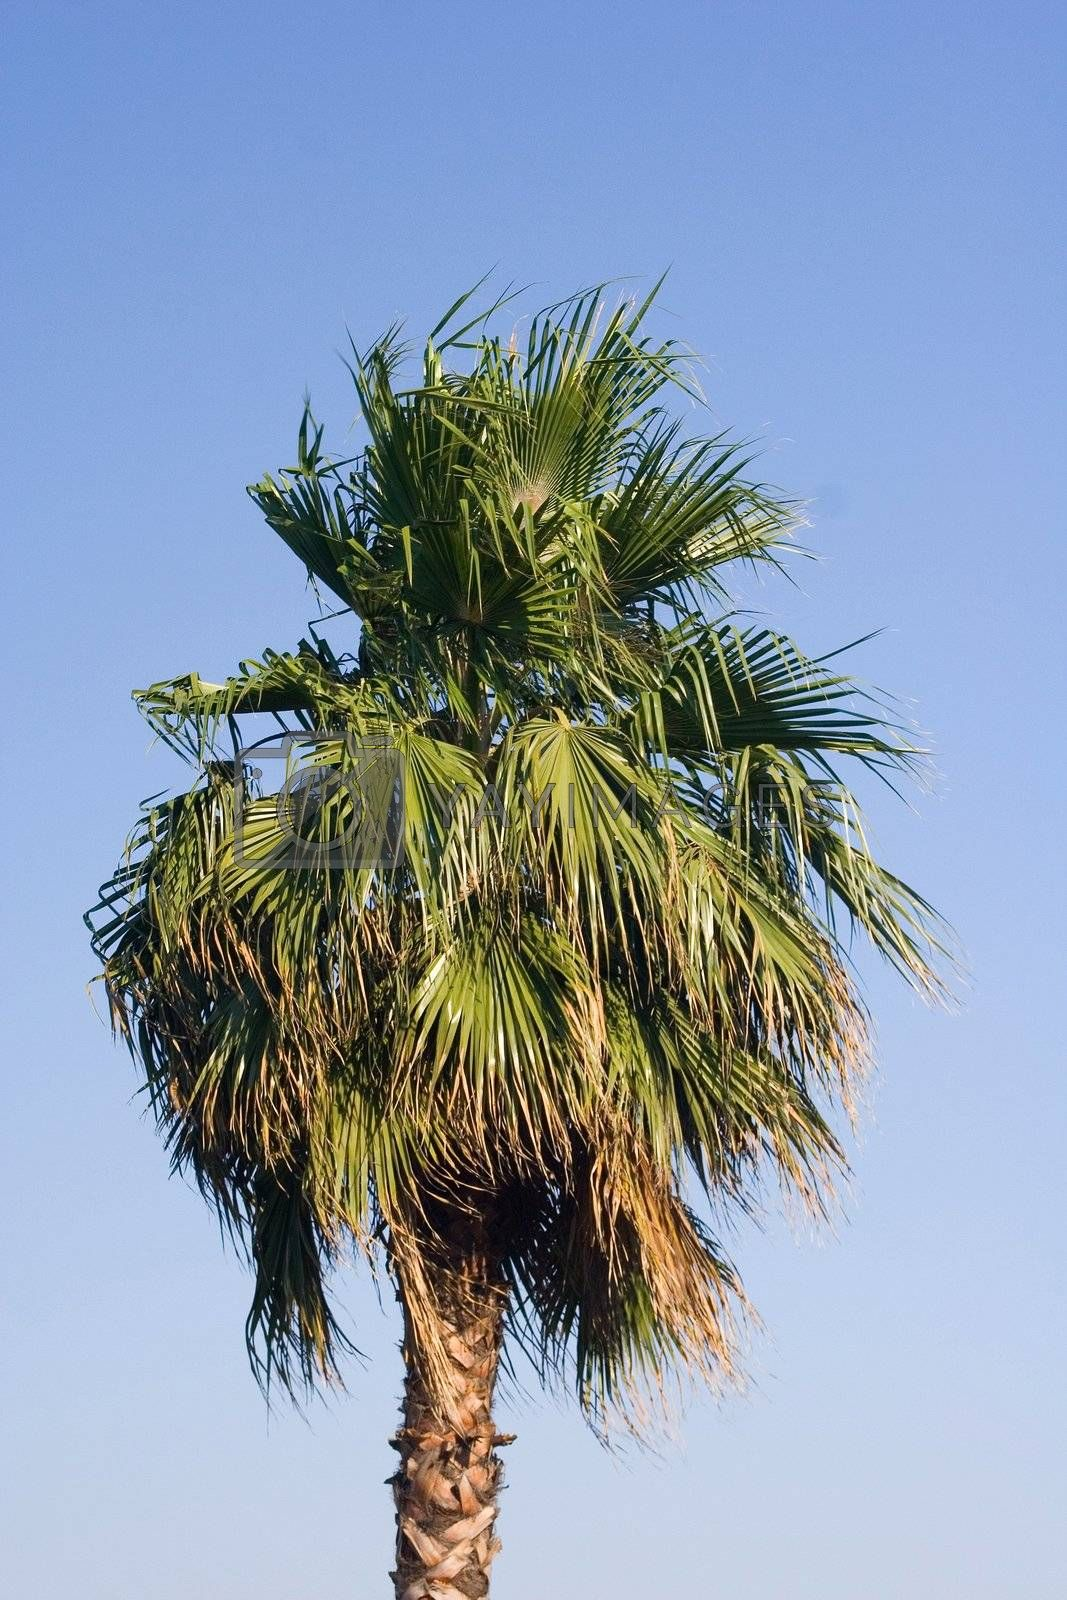 sky palm tree blue leaves tropical light relax